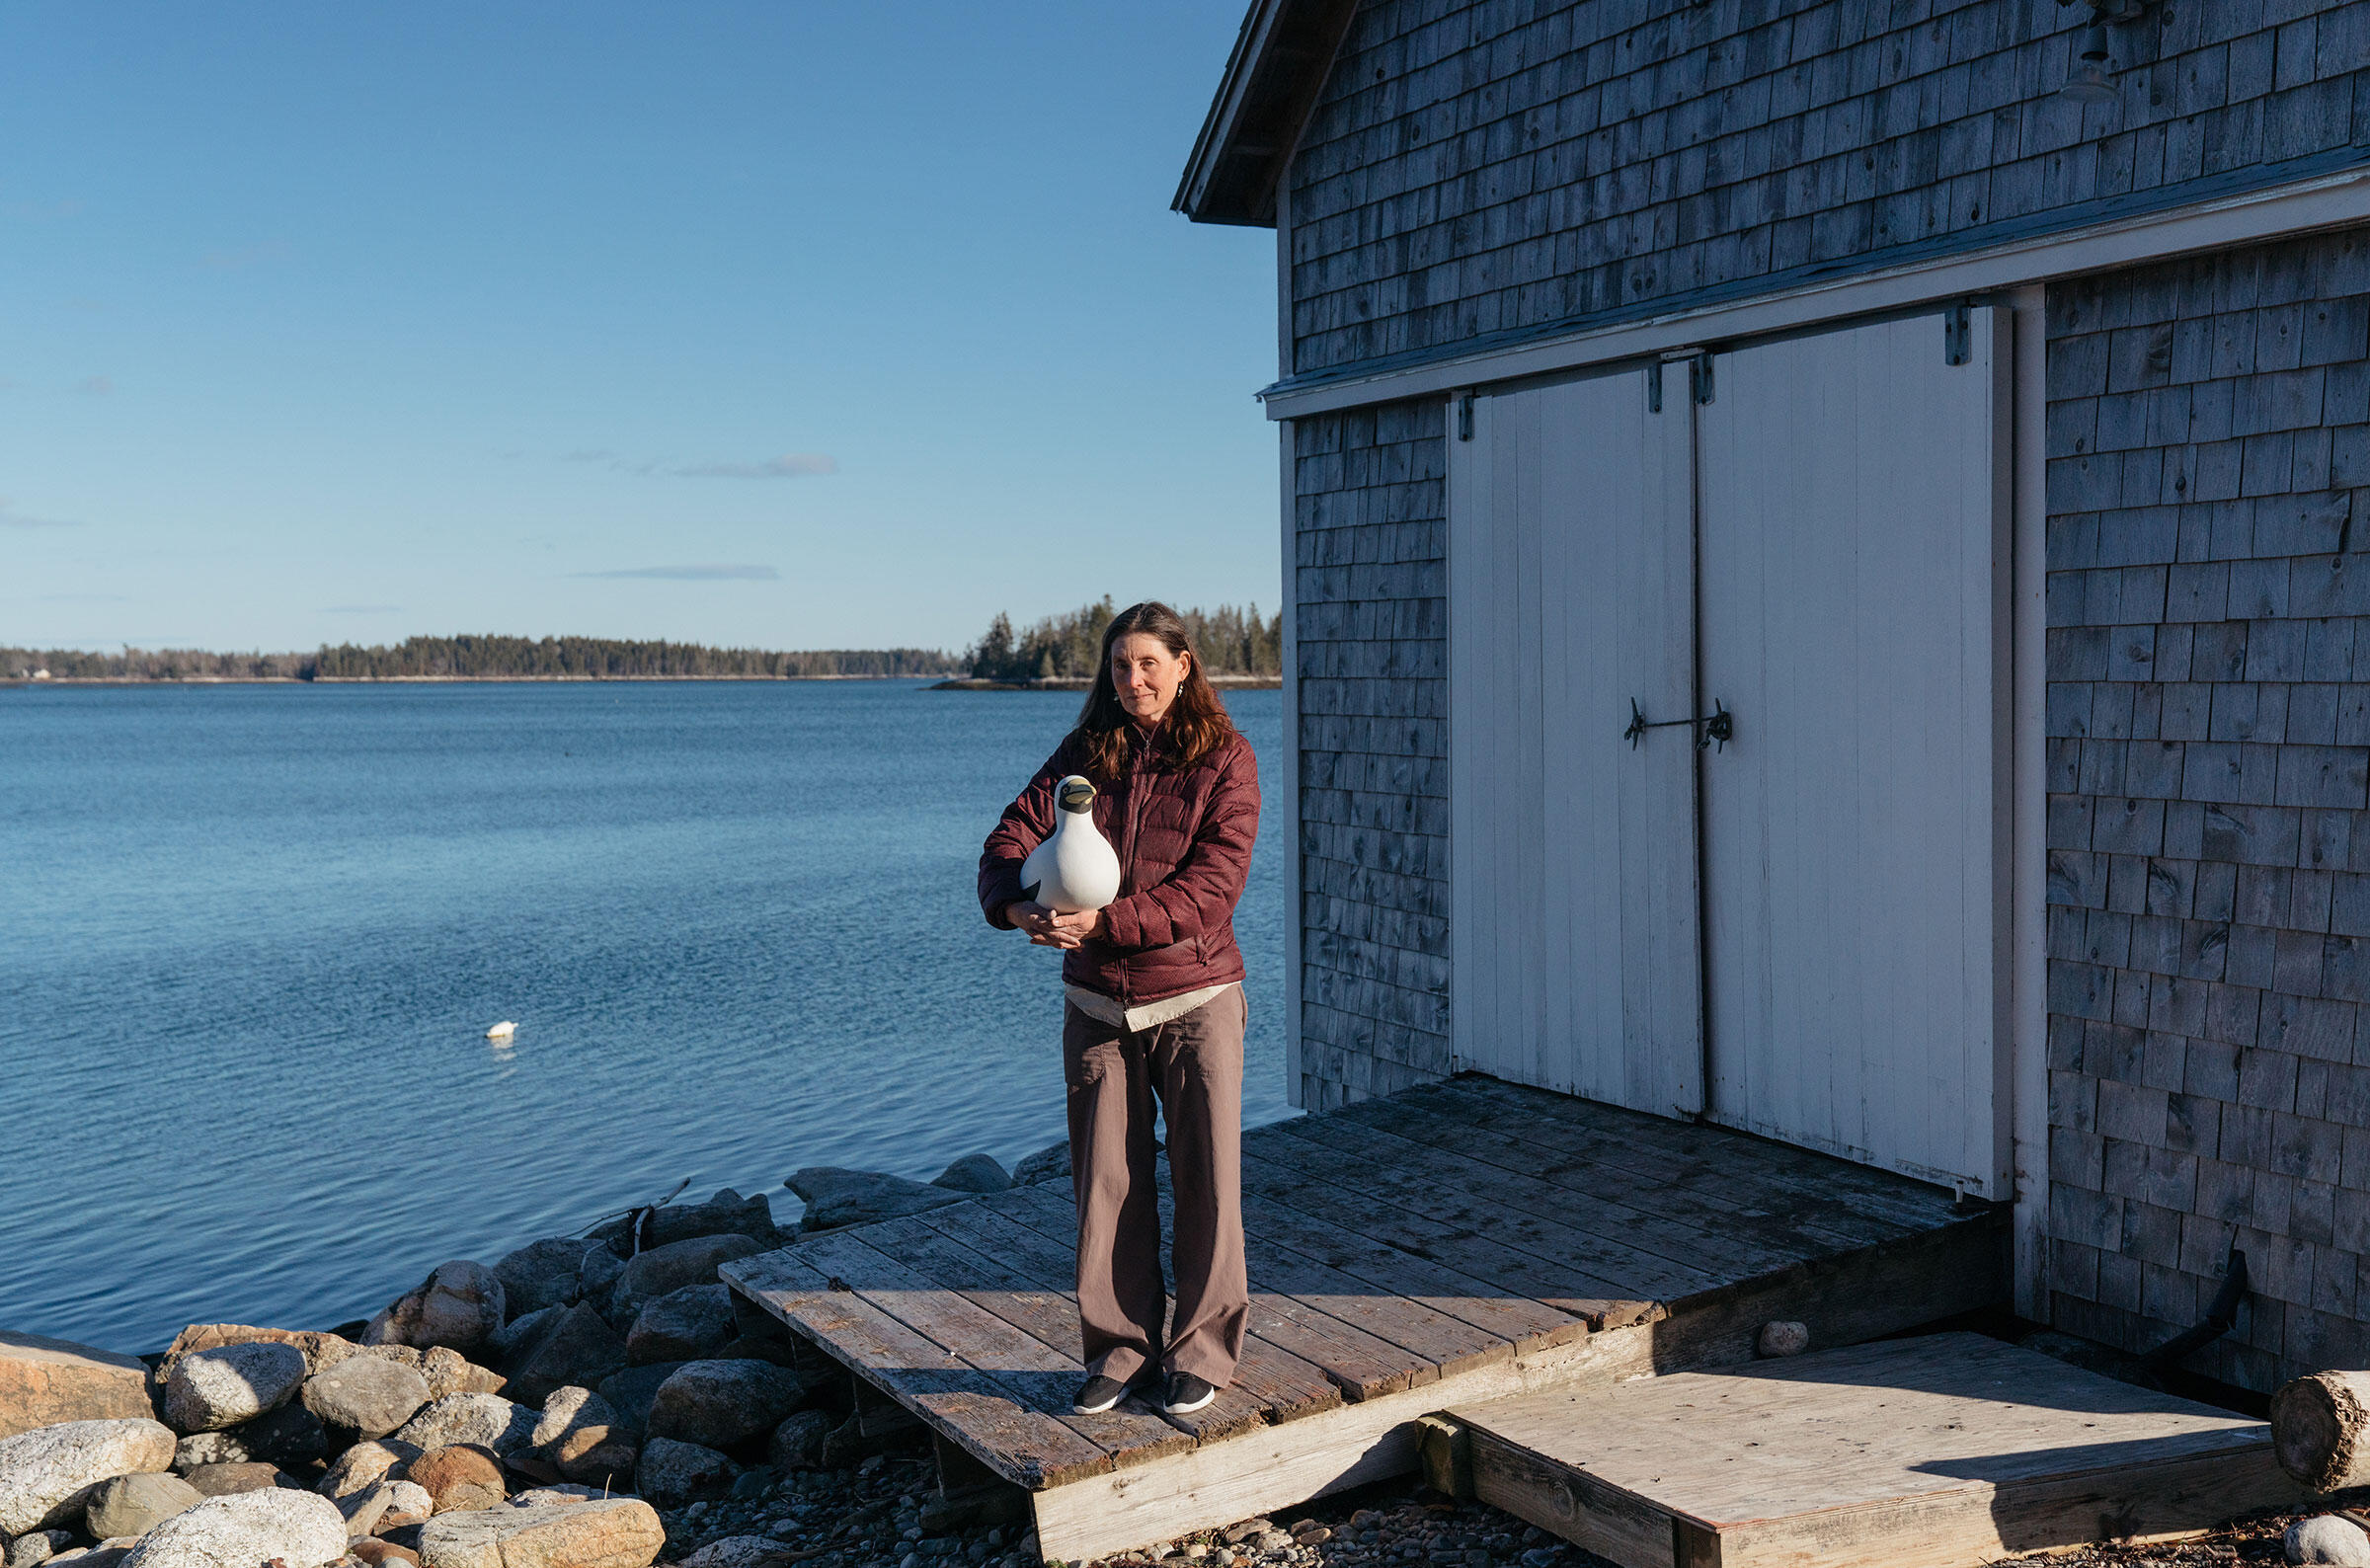 Sue Schubel, decoy project manager, with a handmade Australasian Gannet decoy at the dock to Hog Island Audubon Camp. Tristan Spinski